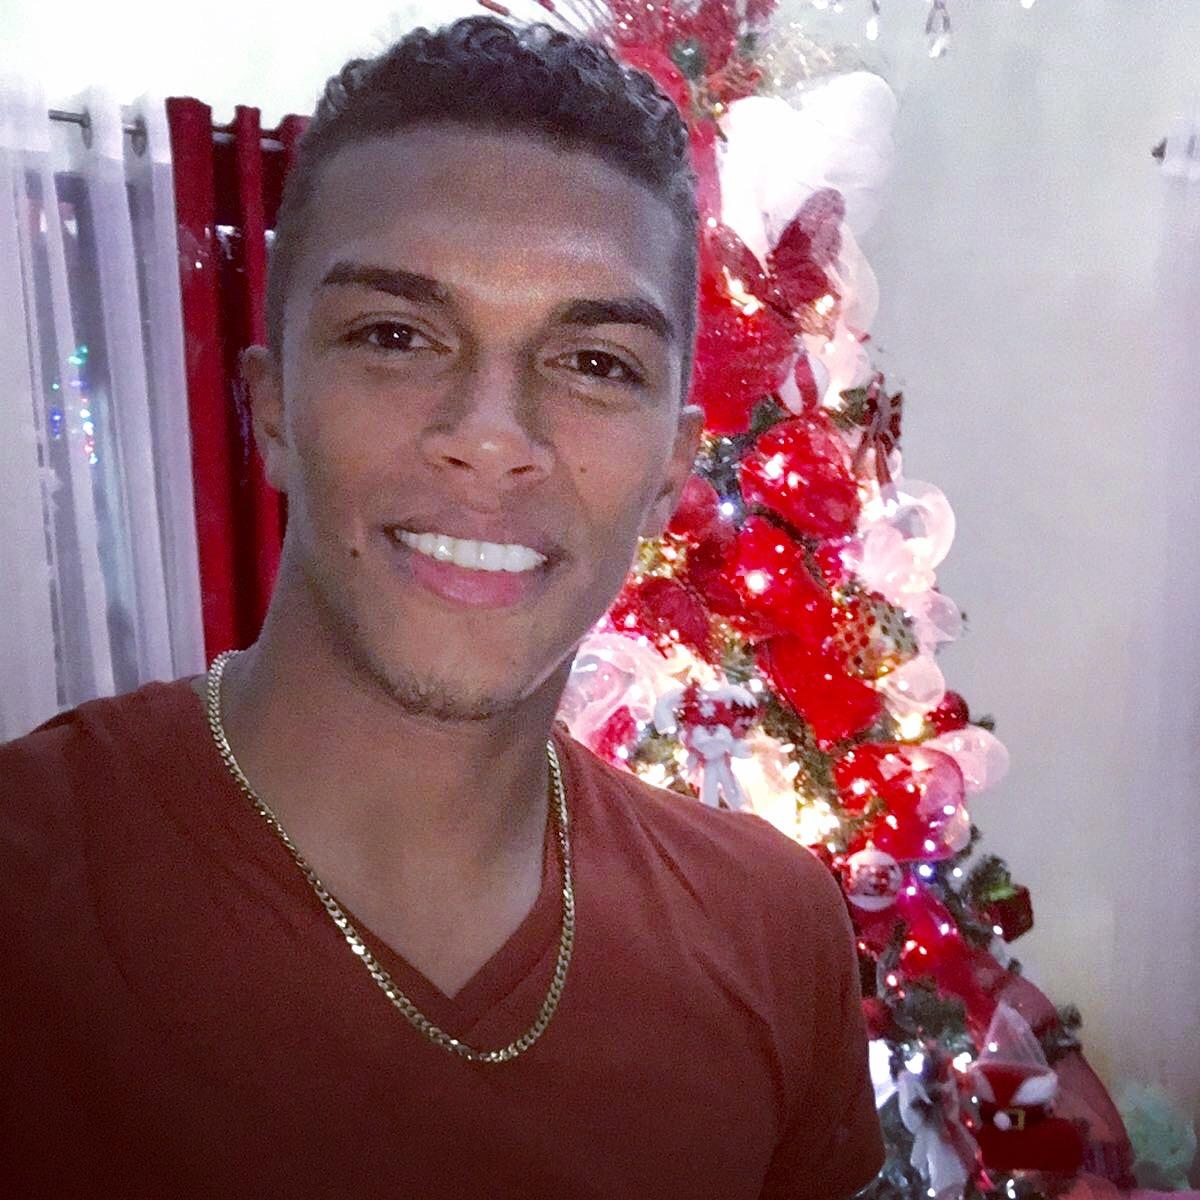 Joel Rafael Duran Trinidad